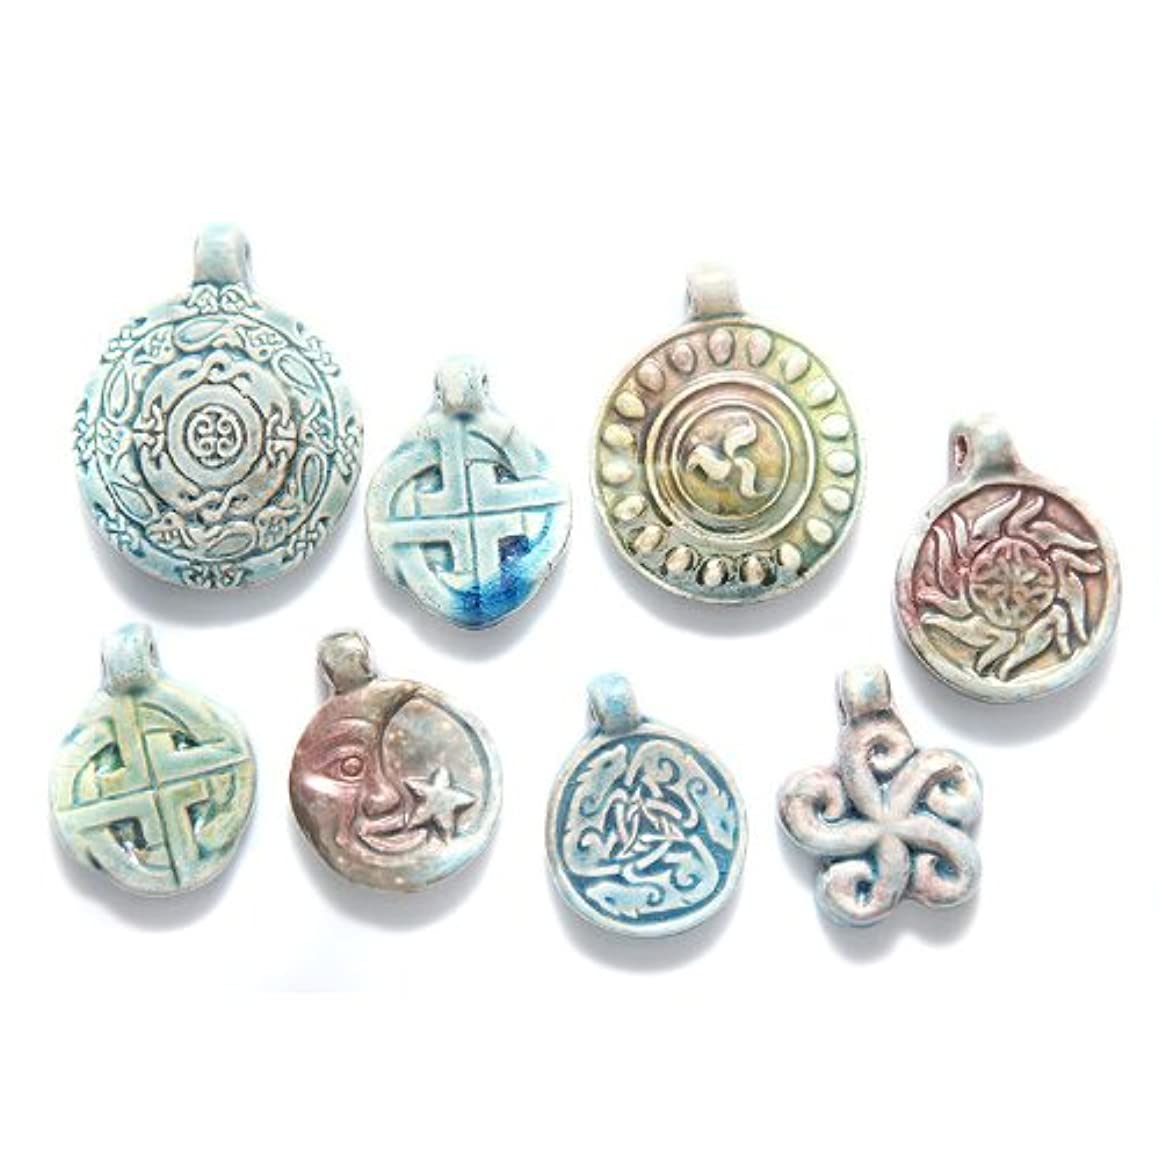 Shipwreck Beads Peruvian Hand Crafted Ceramic Raku Glazed Pendants, Assorted Color, 3 Per Pack